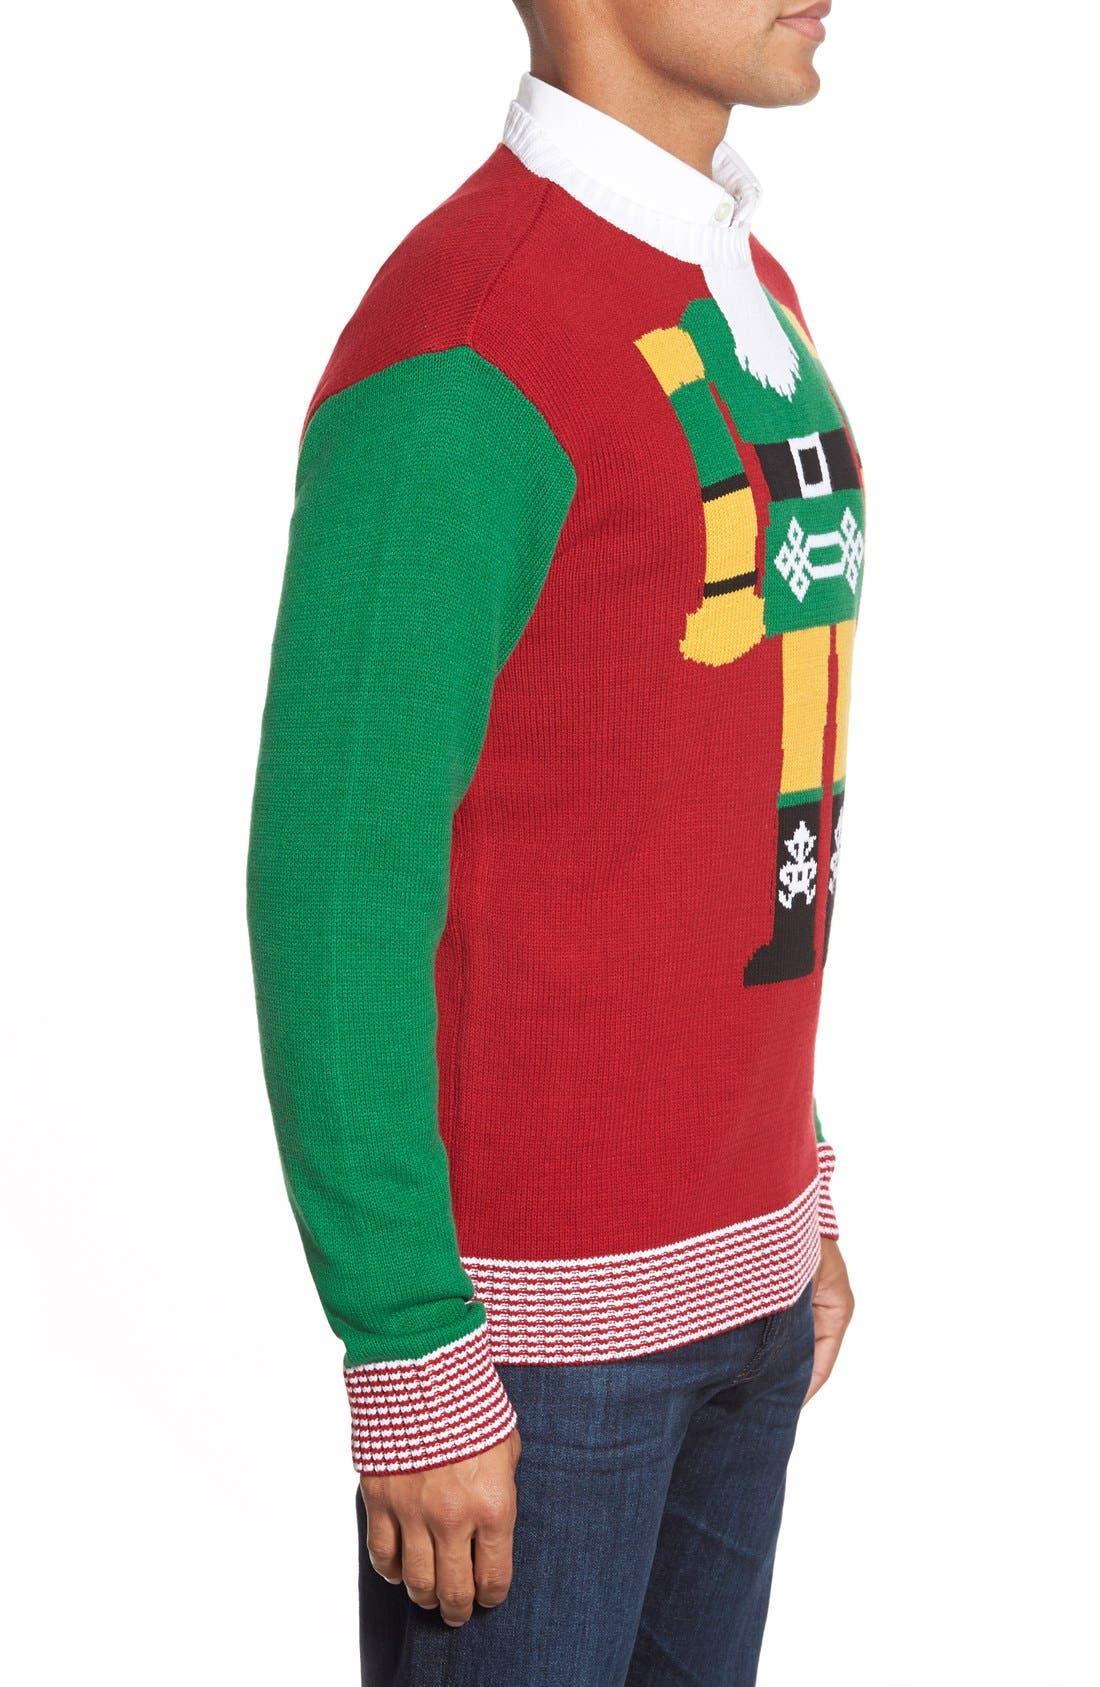 Alternate Image 3  - Ugly Christmas Sweater 'Nutcracker Face' Holiday Crewneck Sweater